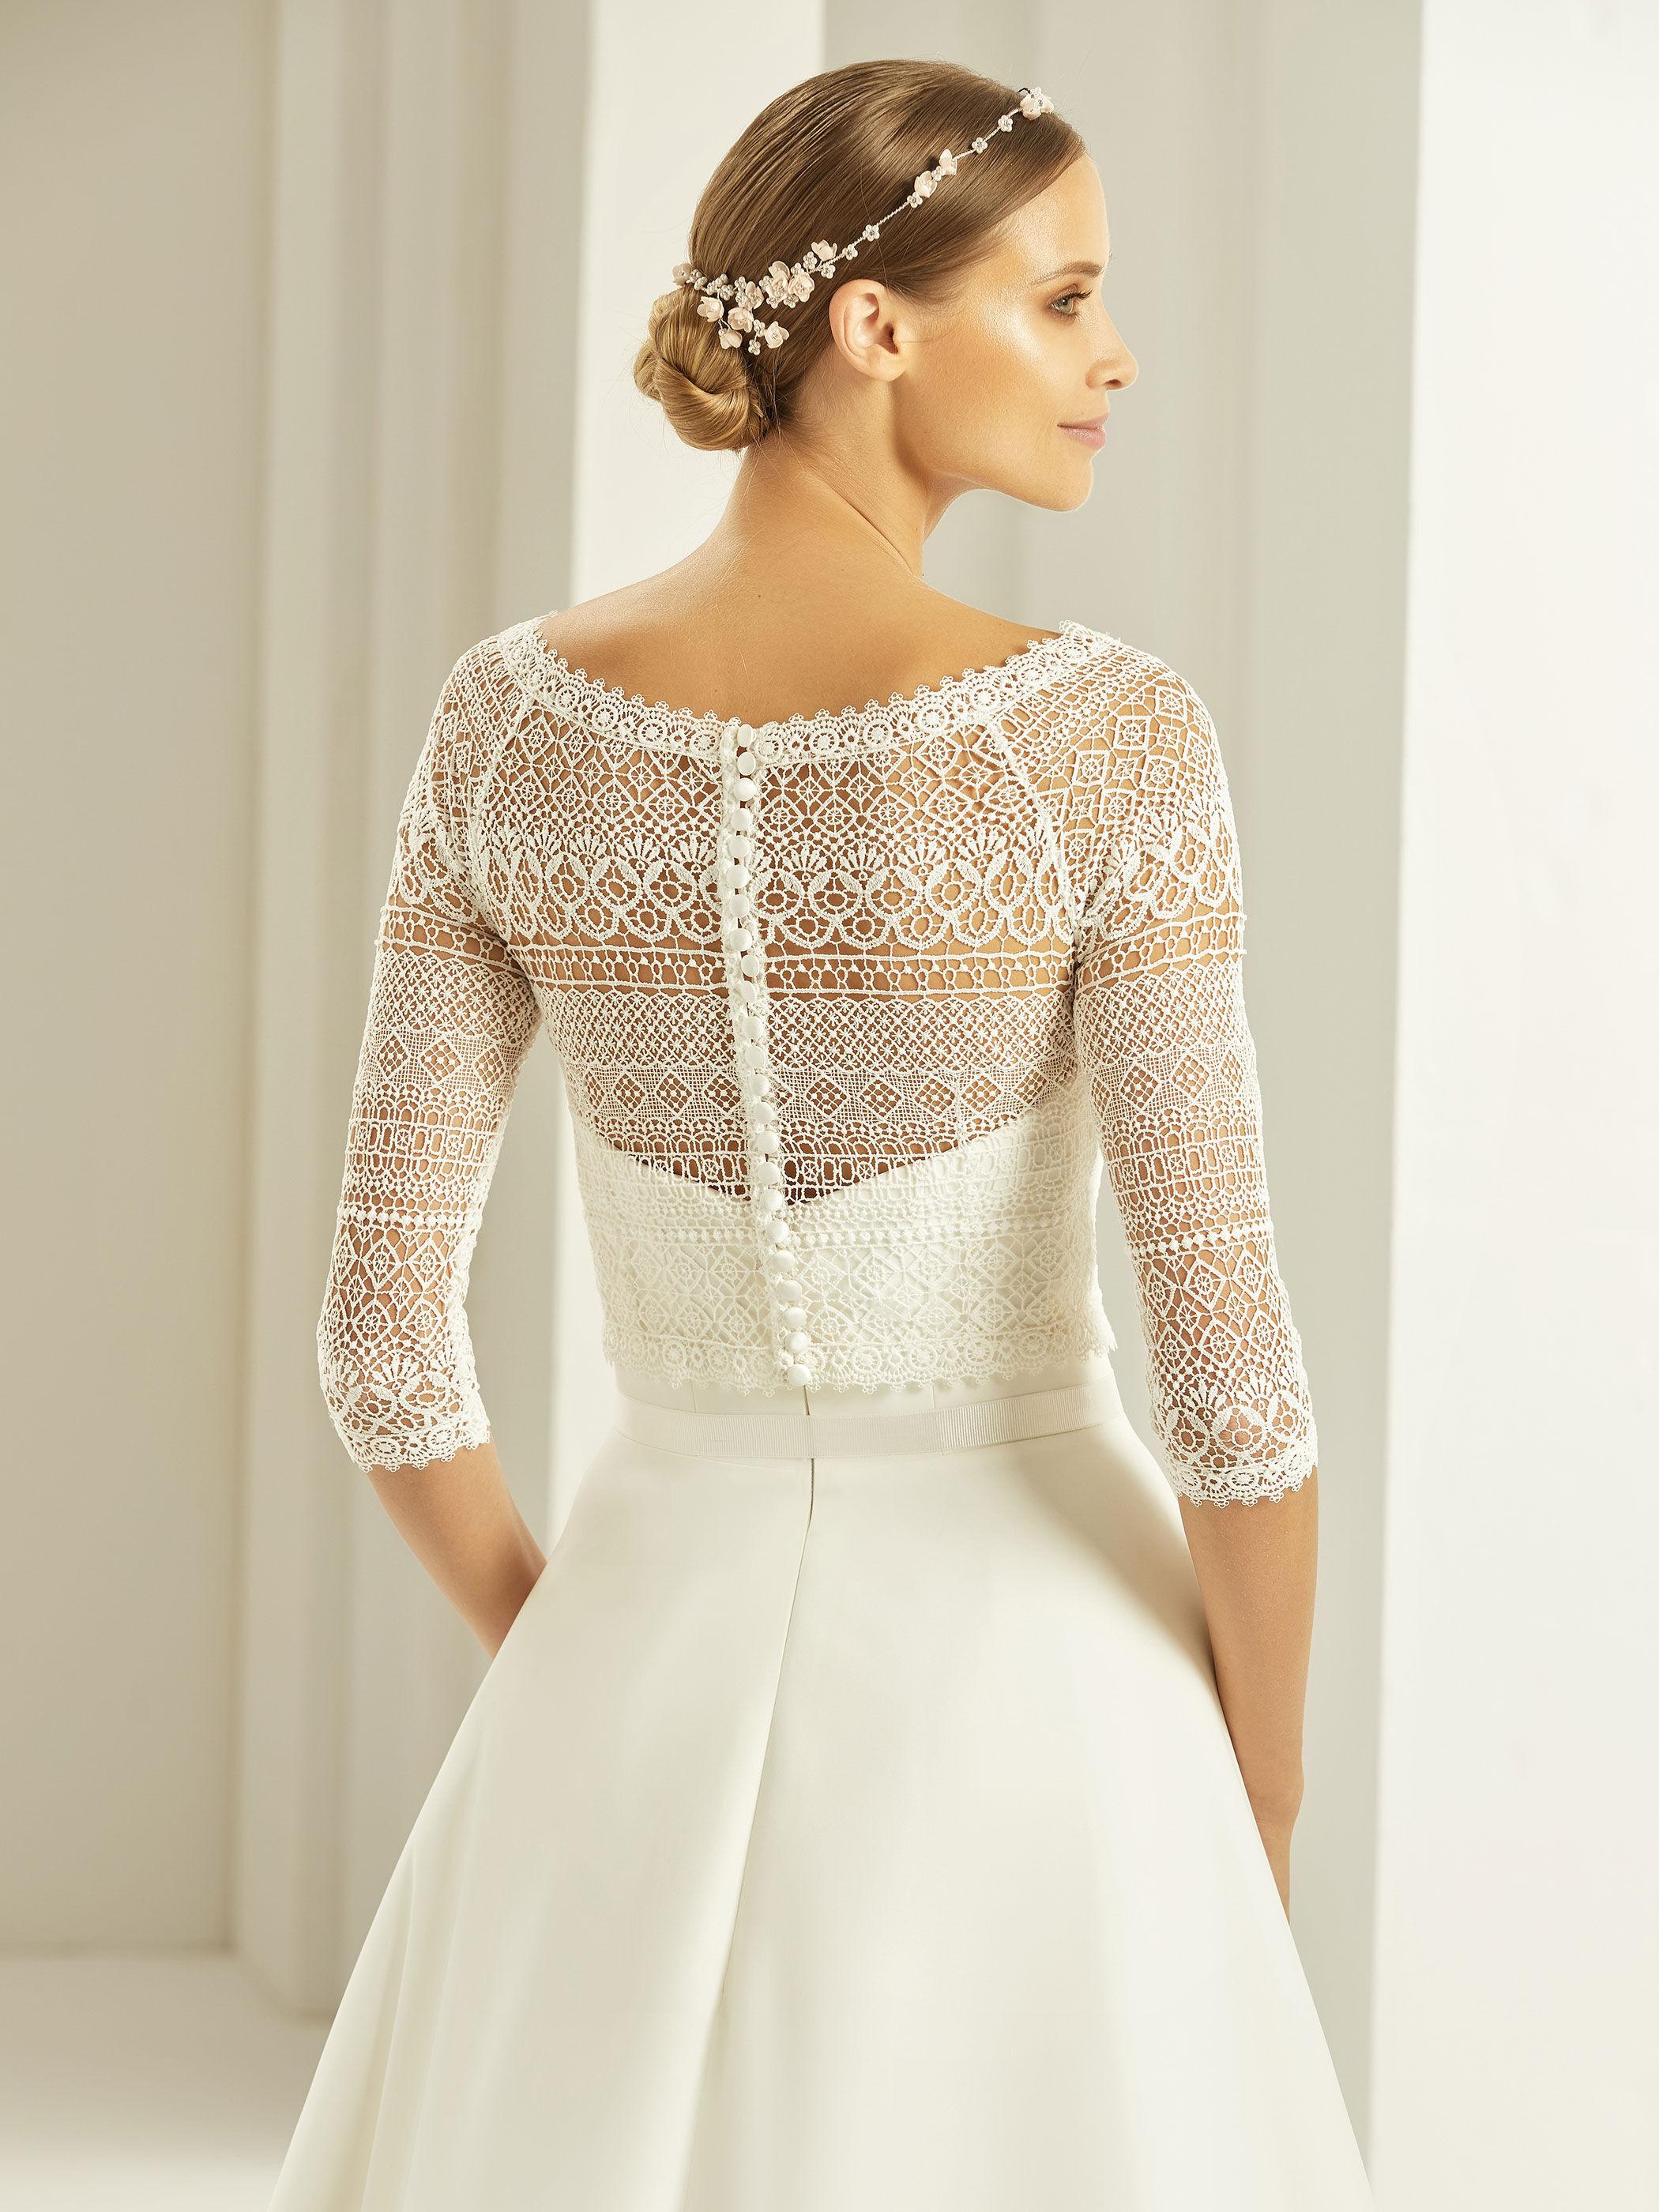 bianco-evento-bridal-bolero-e280-_2__2.j